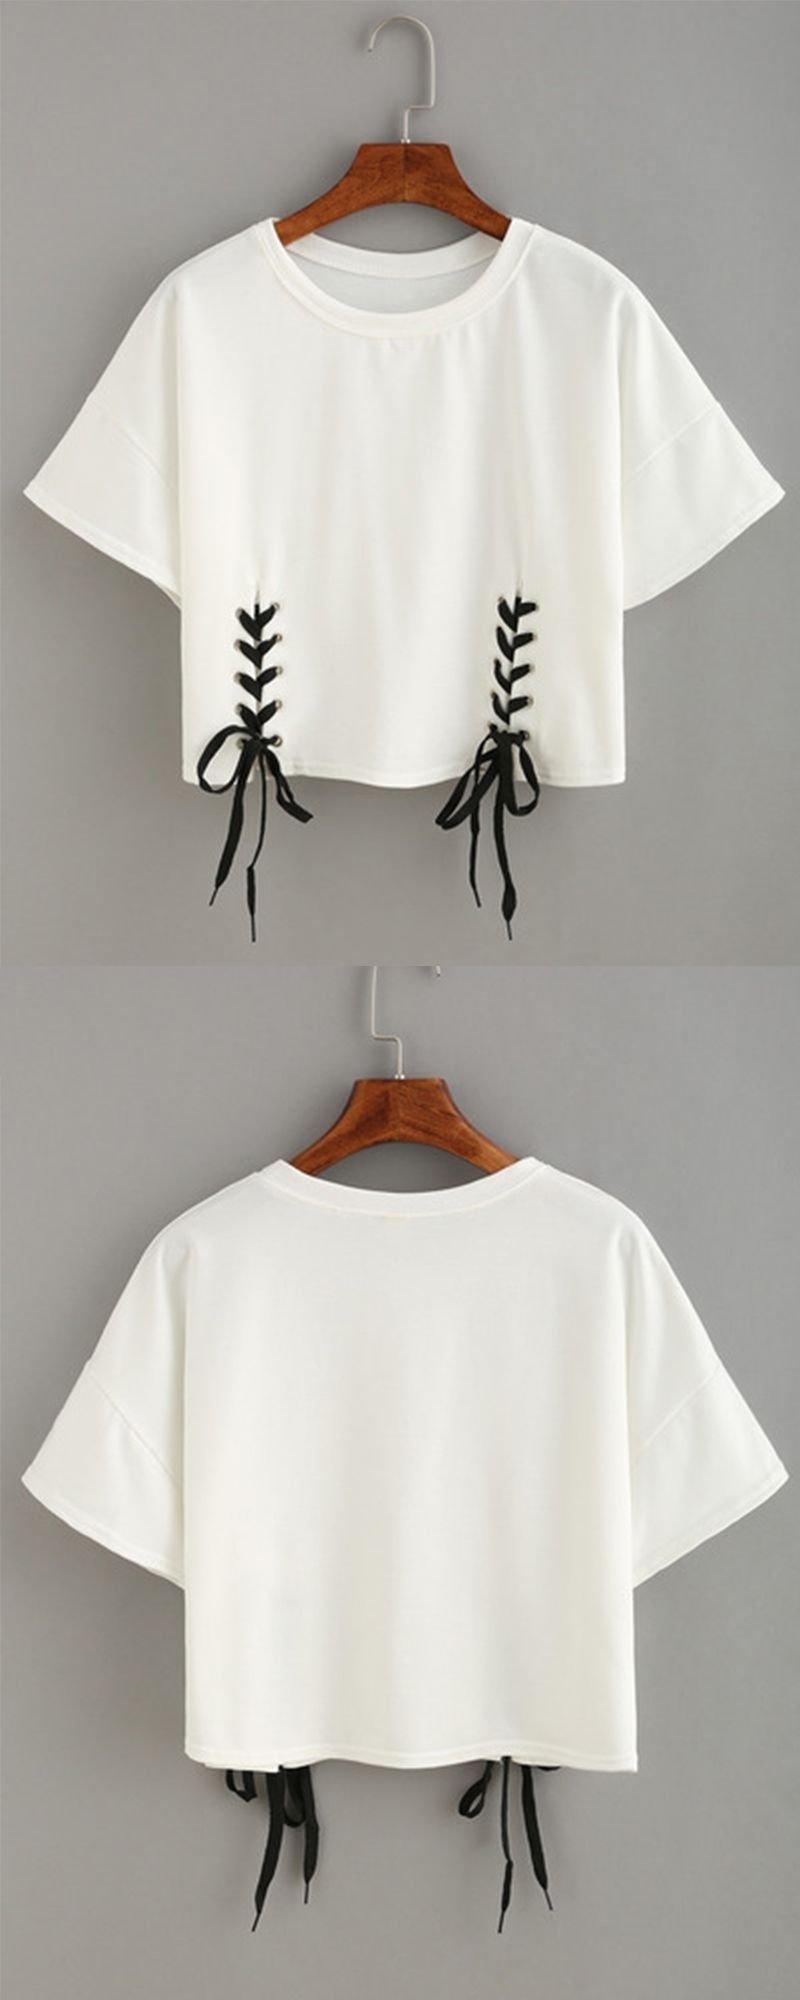 10 Lovely Ideas For Cutting T Shirts pinbenita the diva diy fashion blog on diy fashion 2020